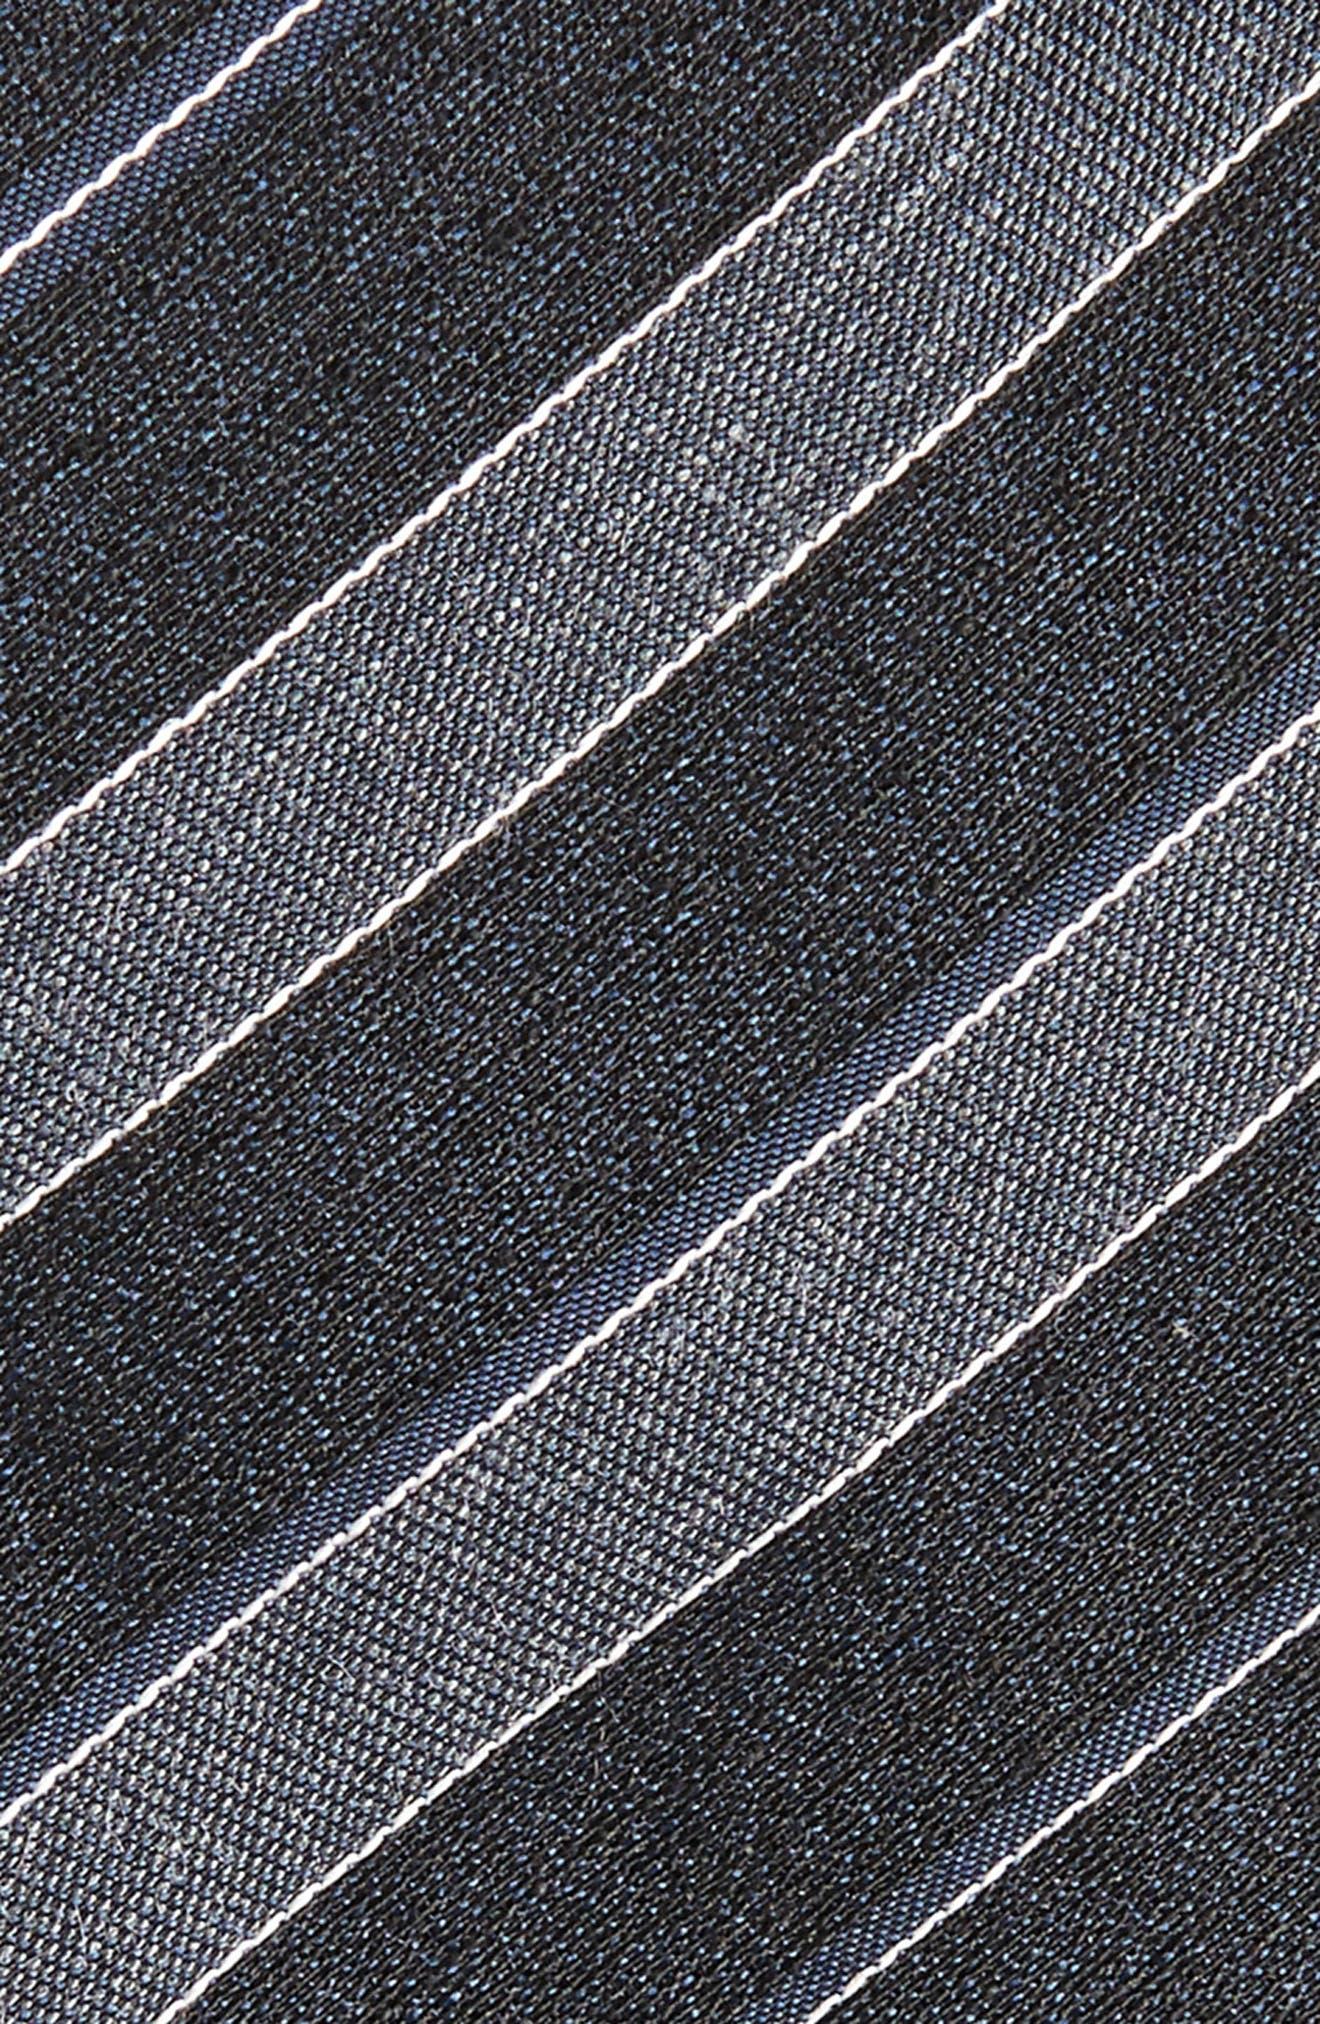 Stripe Silk Blend Tie,                             Alternate thumbnail 2, color,                             021